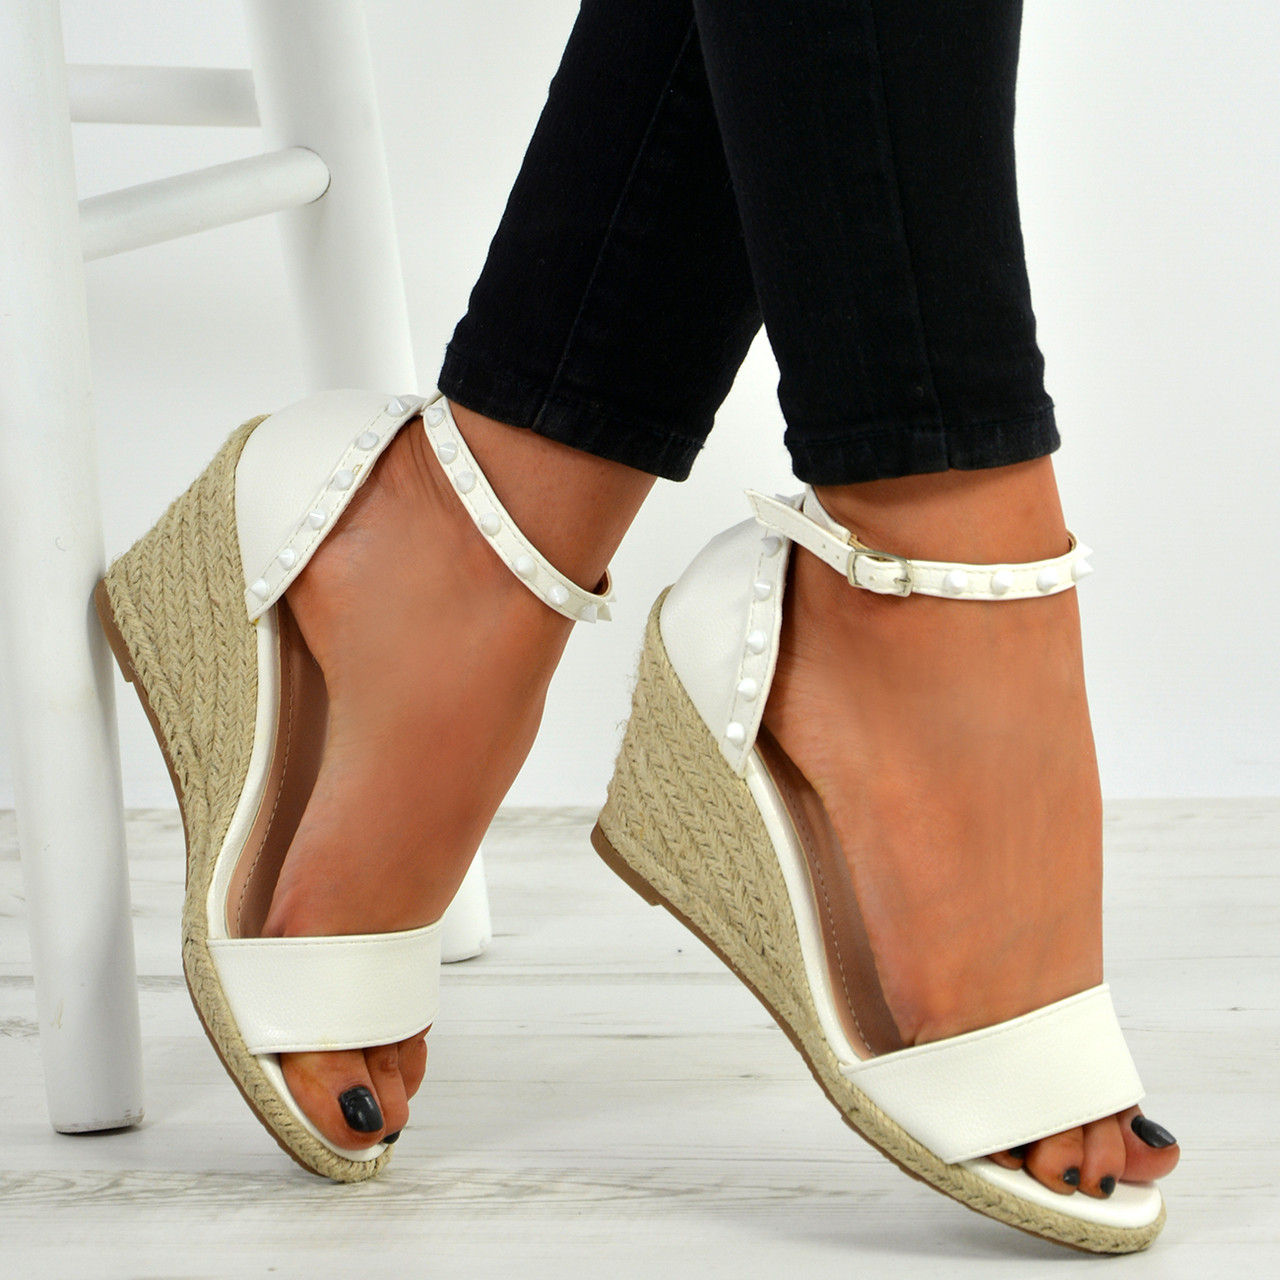 9741ddffb67 New Womens Ladies Rock Studs Peep Toe Espadrille Wedge Platforms Sandals  Shoes